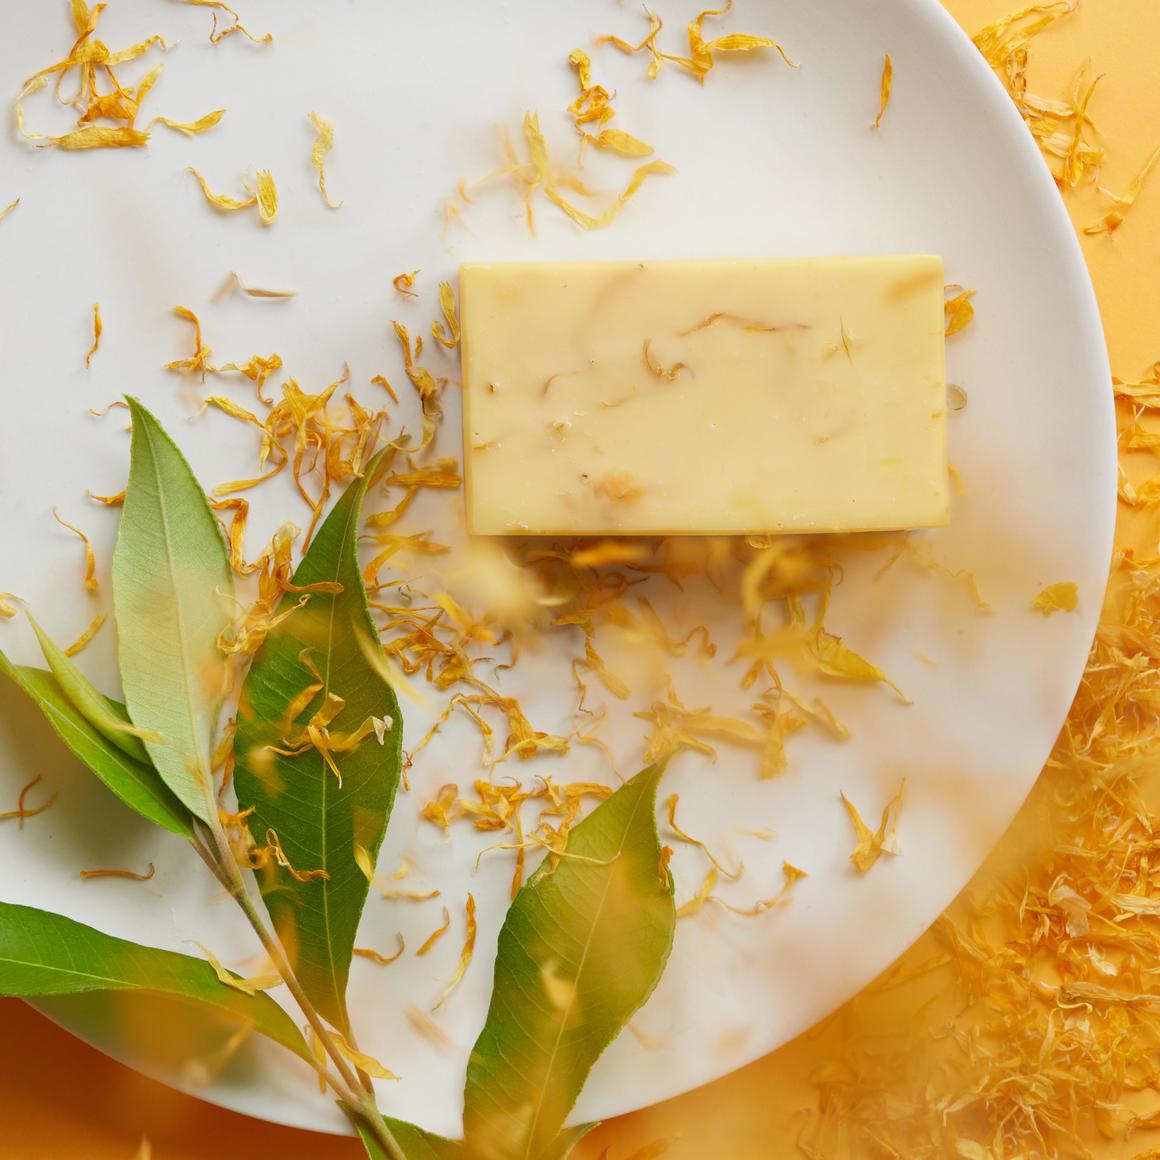 Lemon Myrtle, Calendula & Yellow Clay Natural Handmade Soap | Trada Marketplace